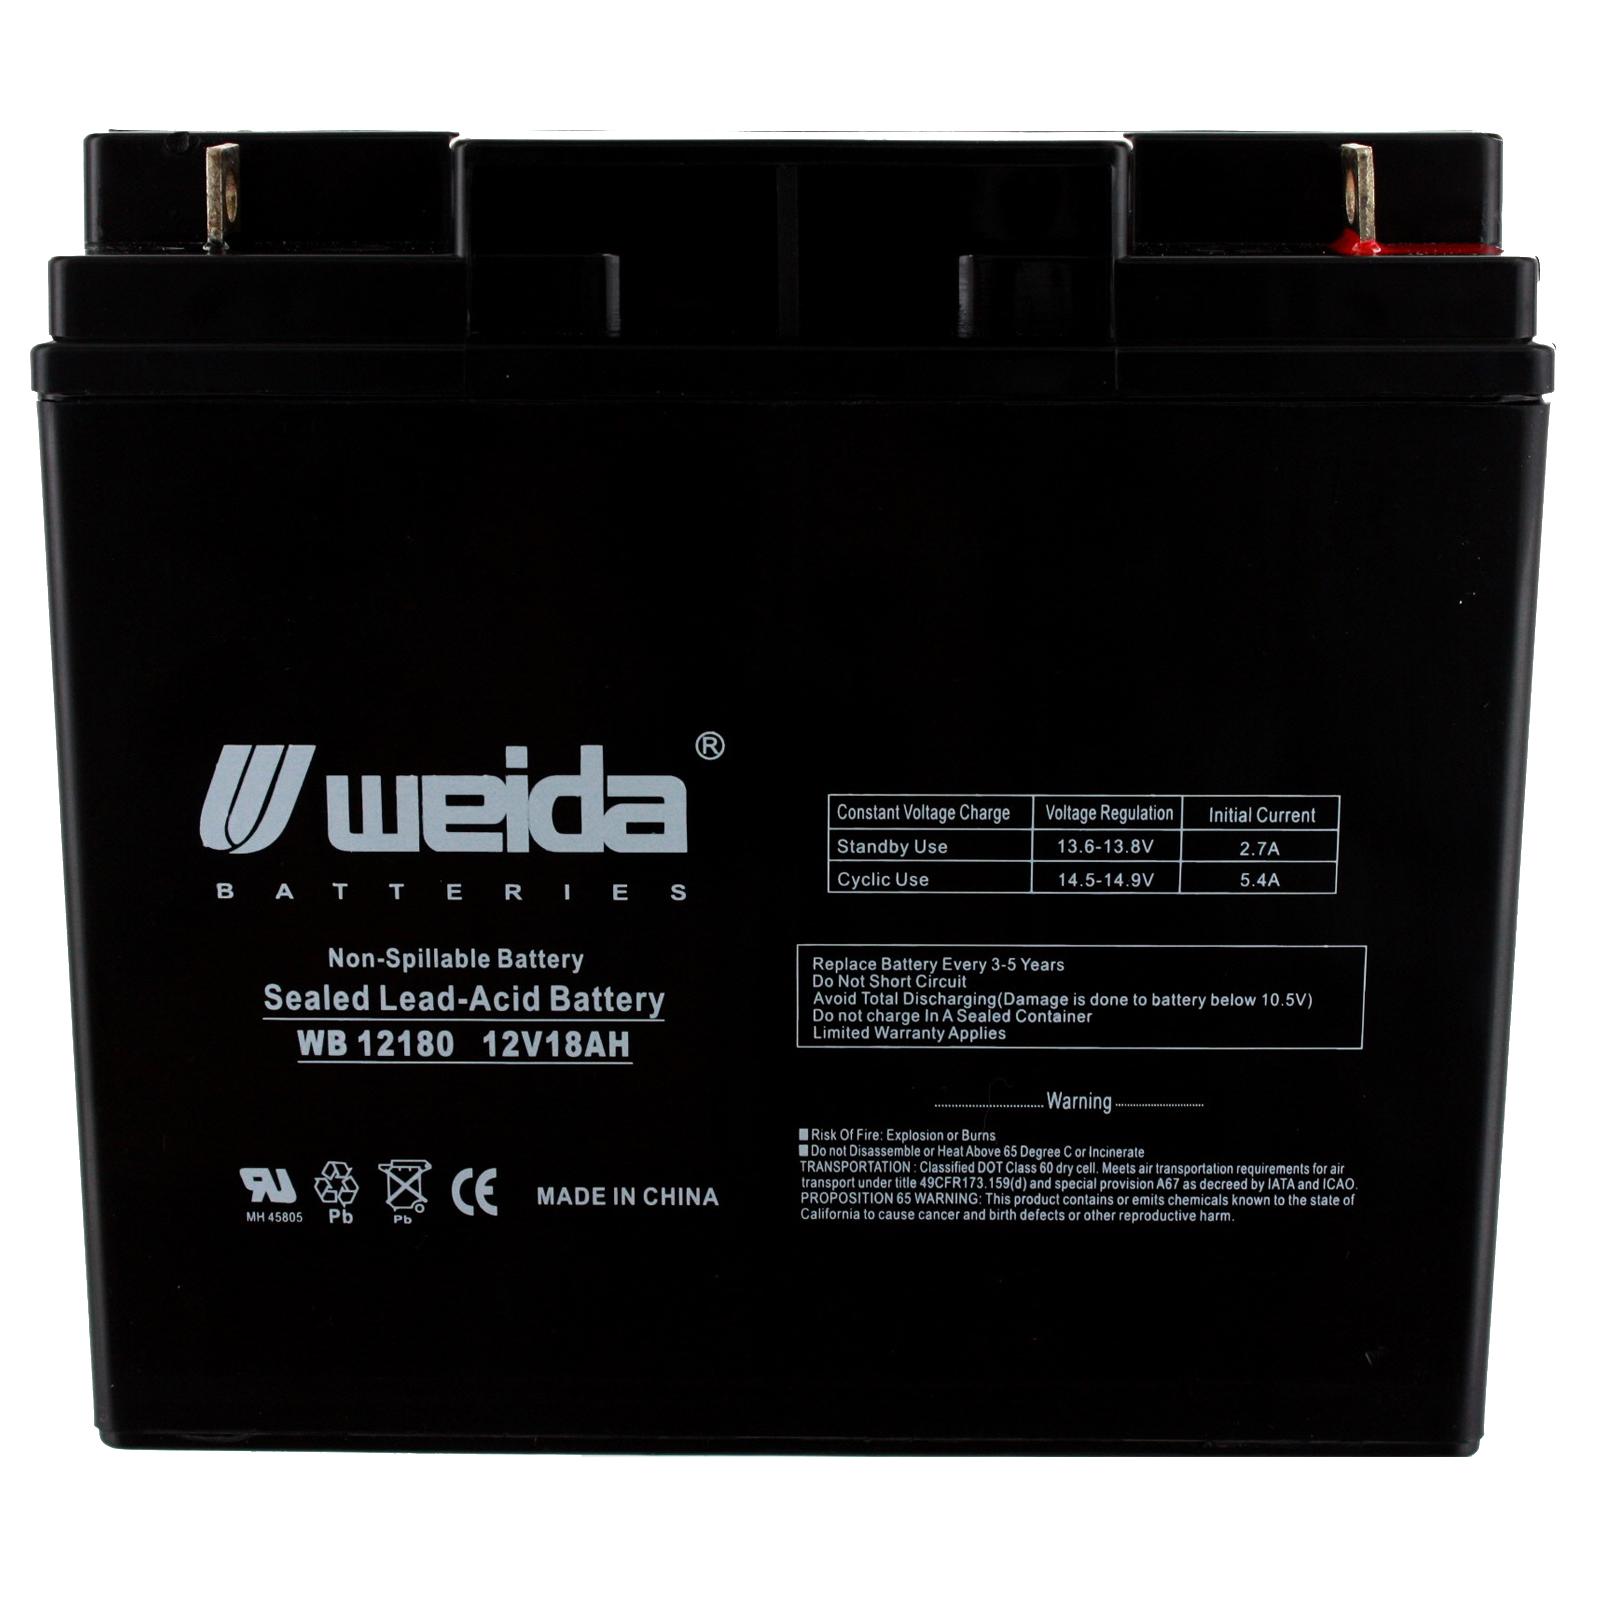 new 12v 18ah sla battery wb12180 for ub12180 ps12180 wka12 18nbl new 12v 18ah sla battery wb12180 for ub12180 ps12180 wka12 18nbl fast usa ship